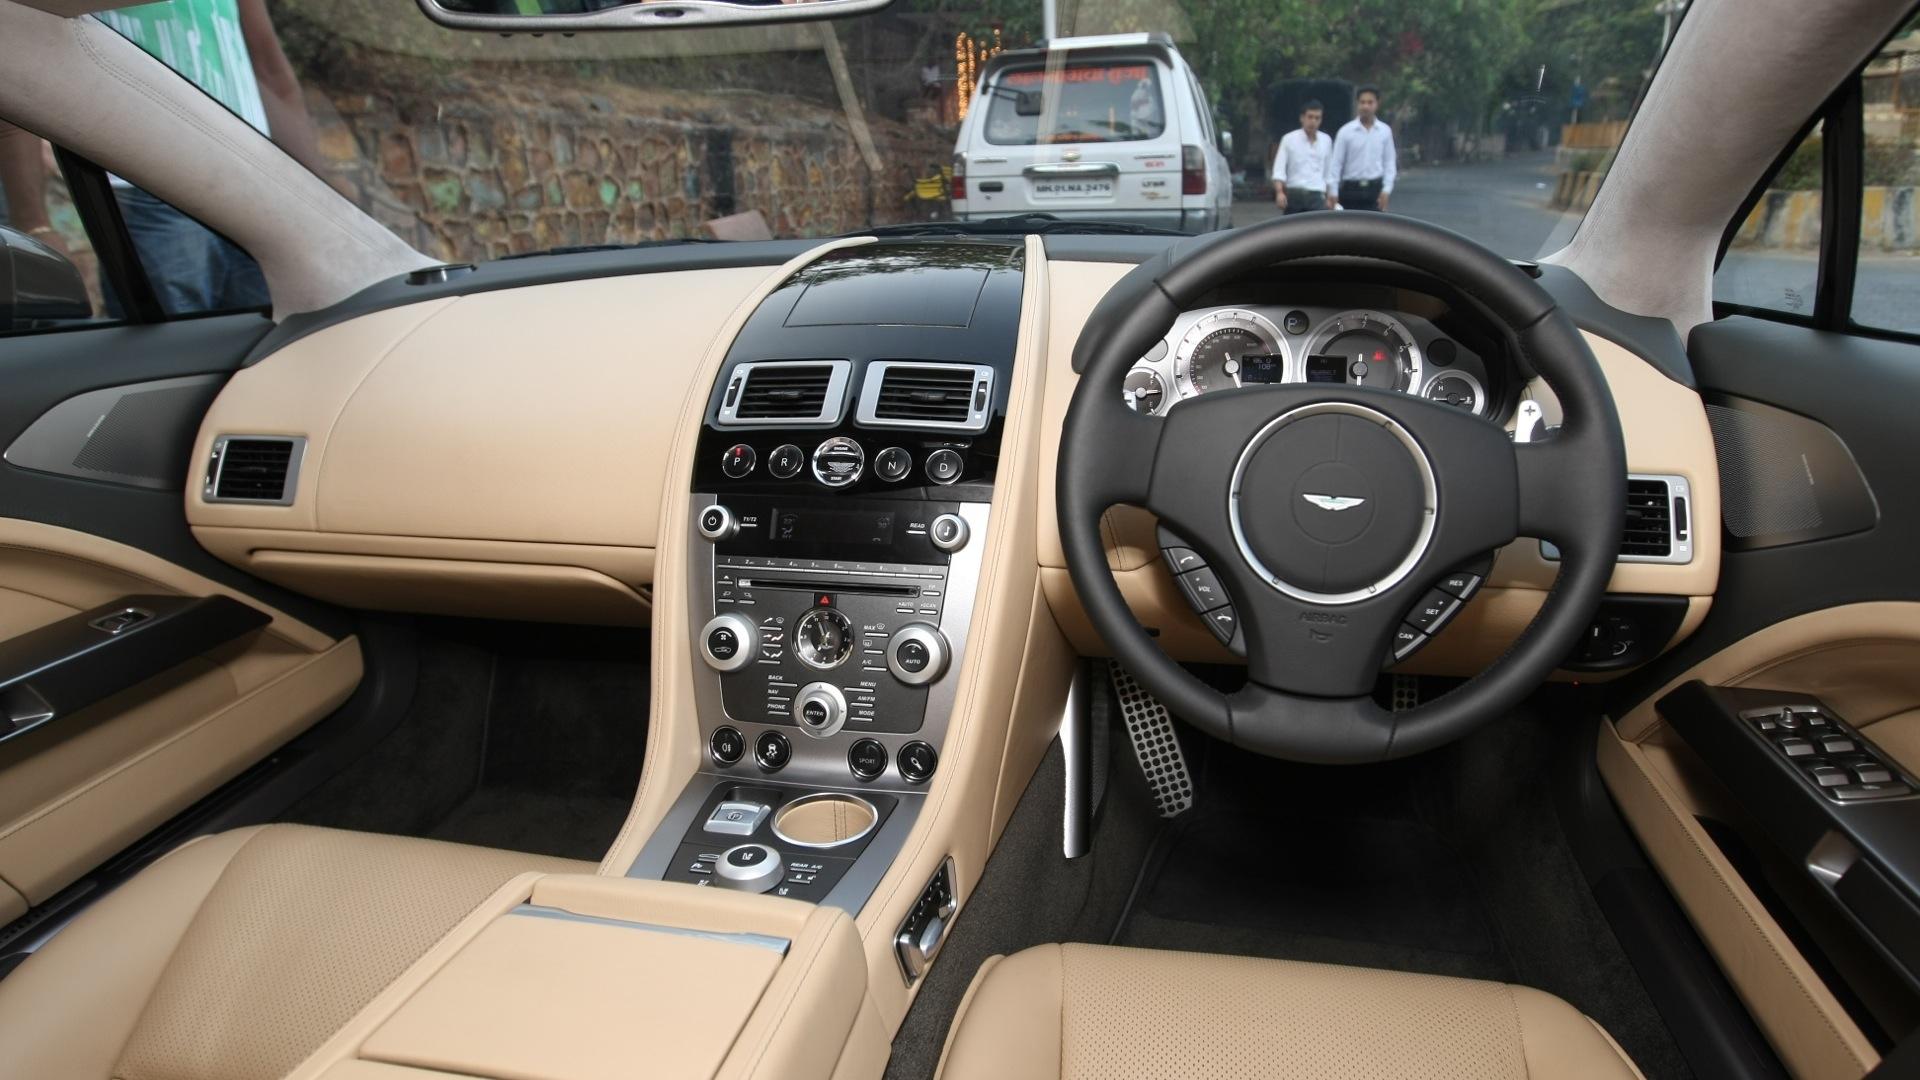 Aston-Martin-Rapide-2013-STD-Interior